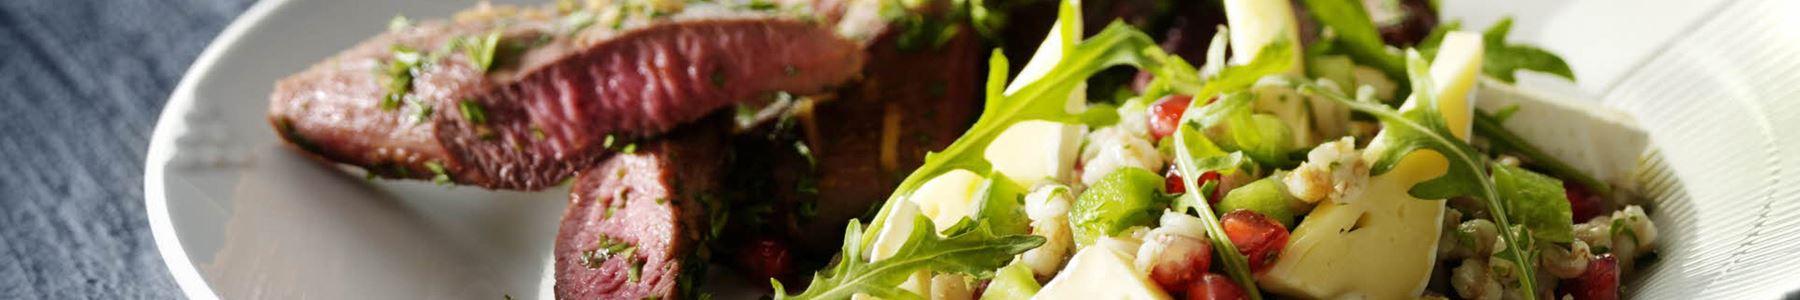 Salater + Lam